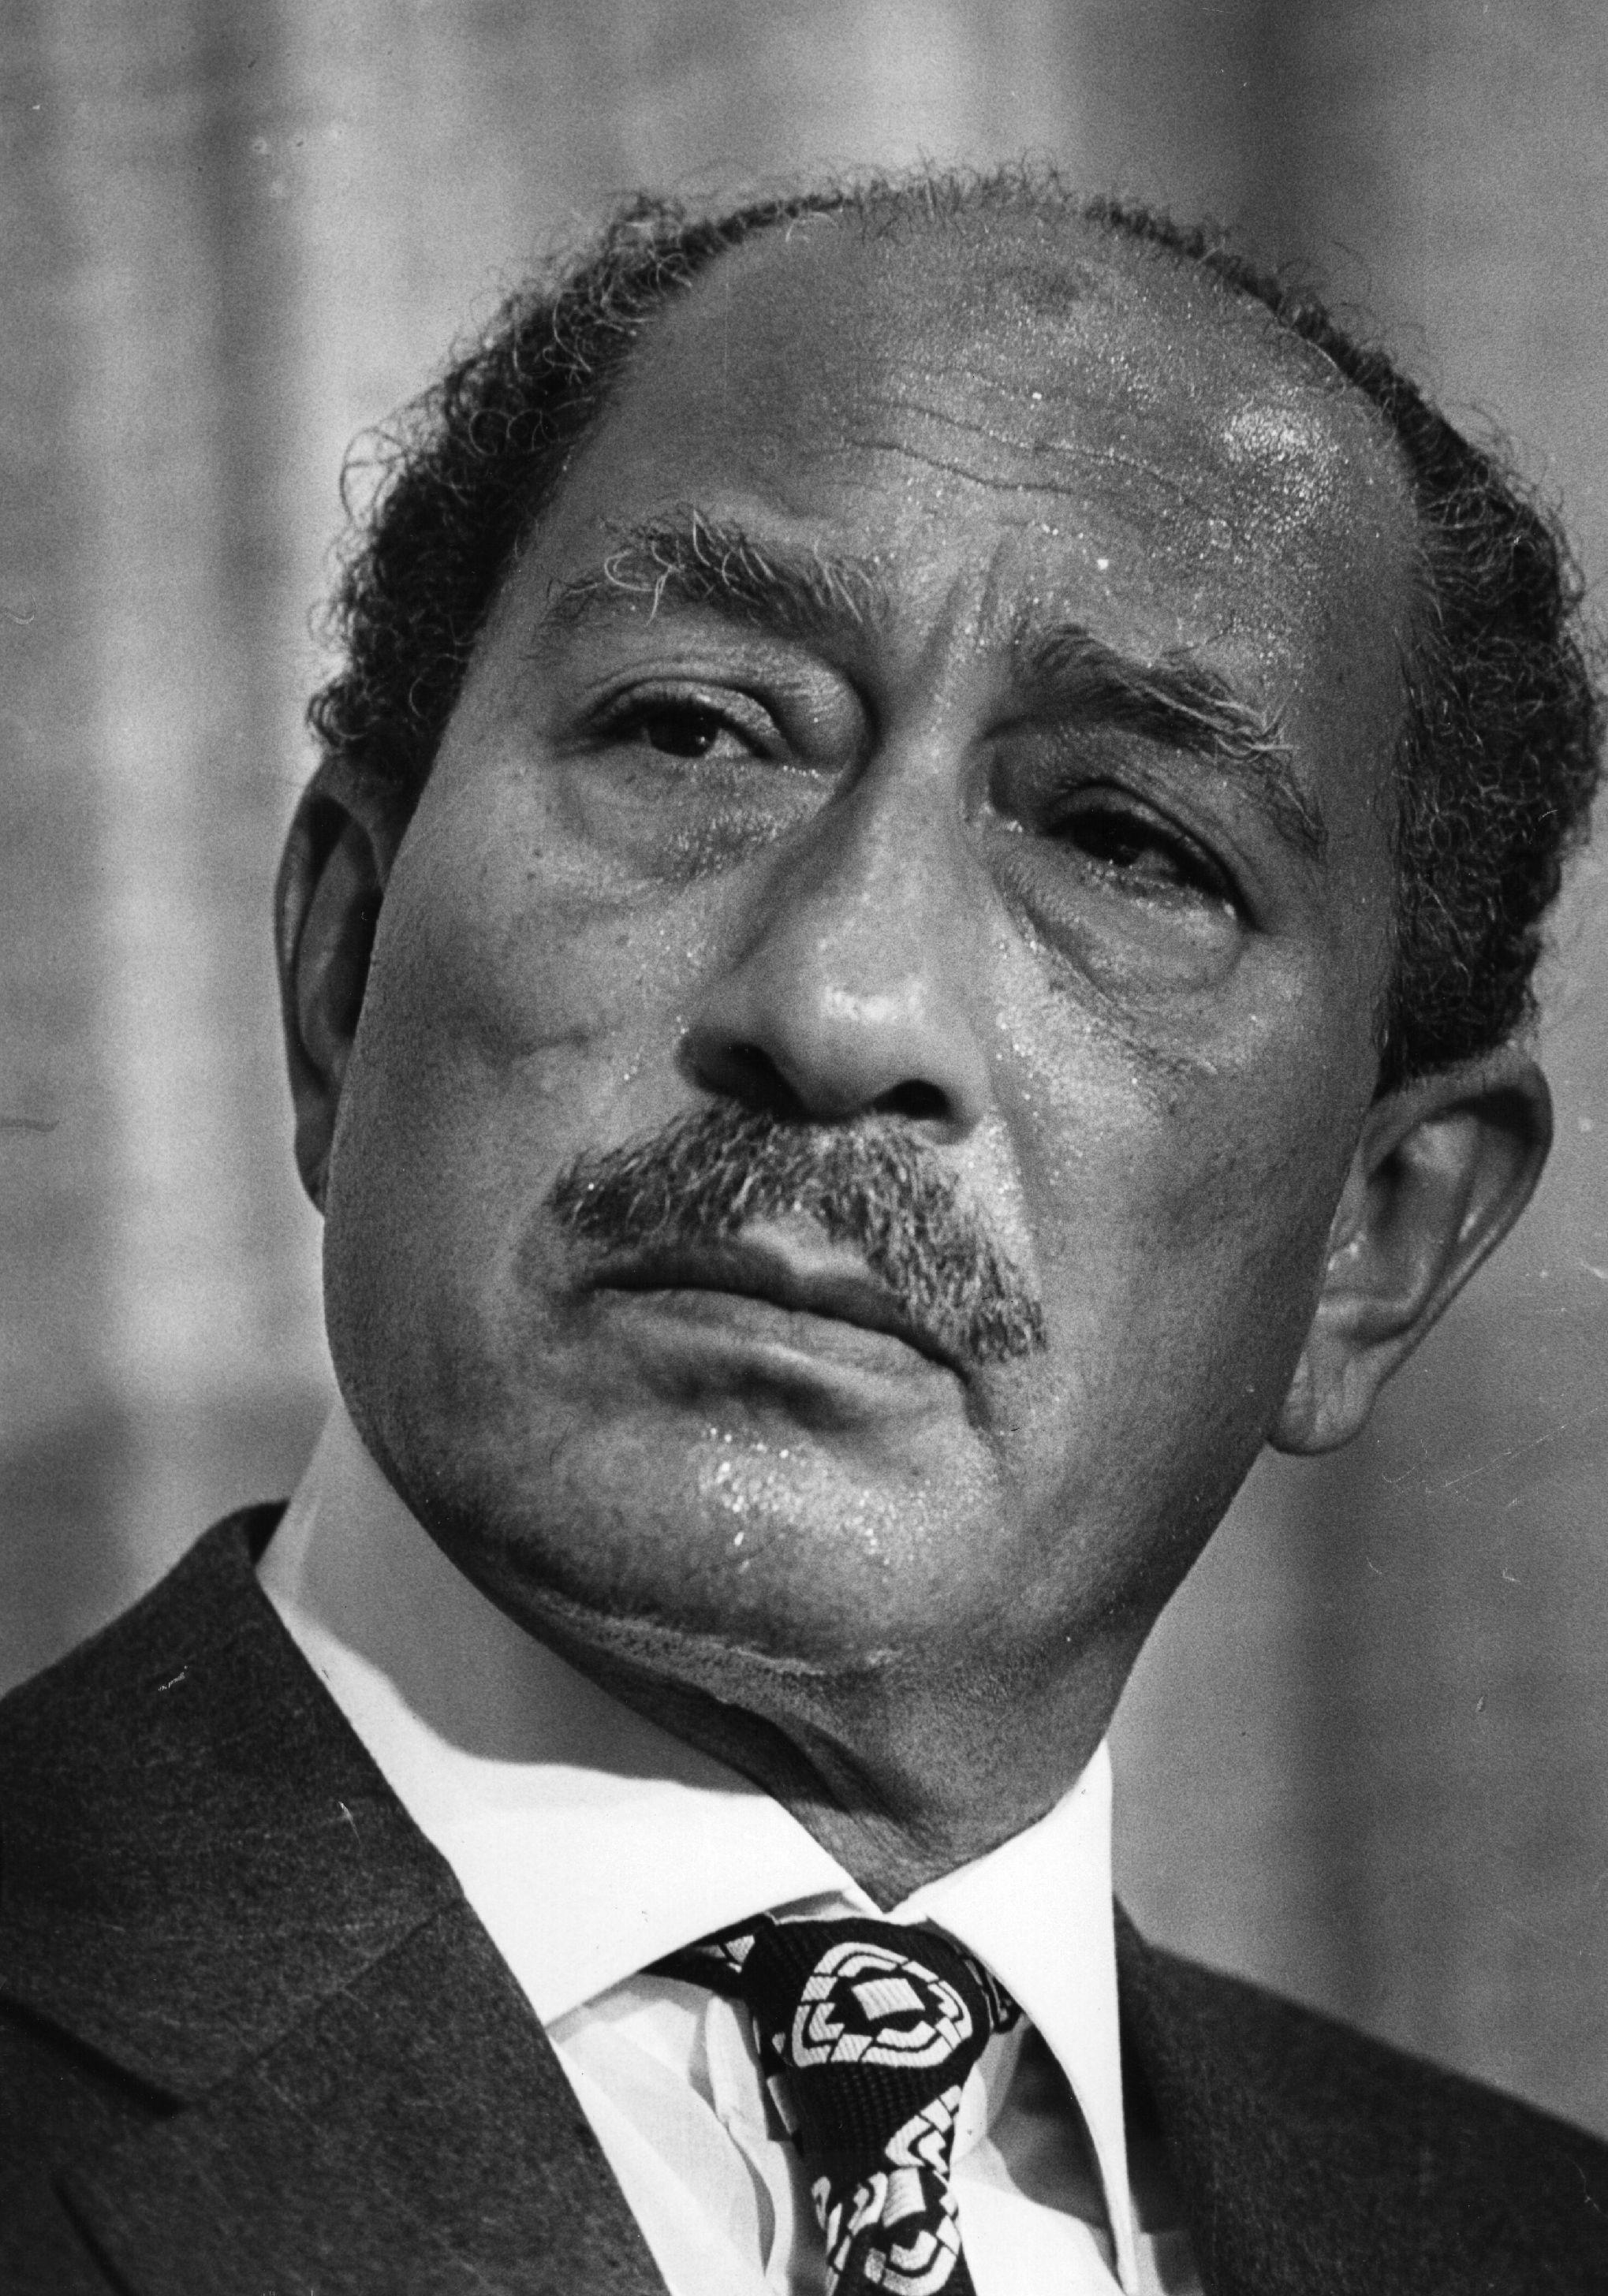 27 Photos of the Events Surrounding the Anwar Sadat Assassination